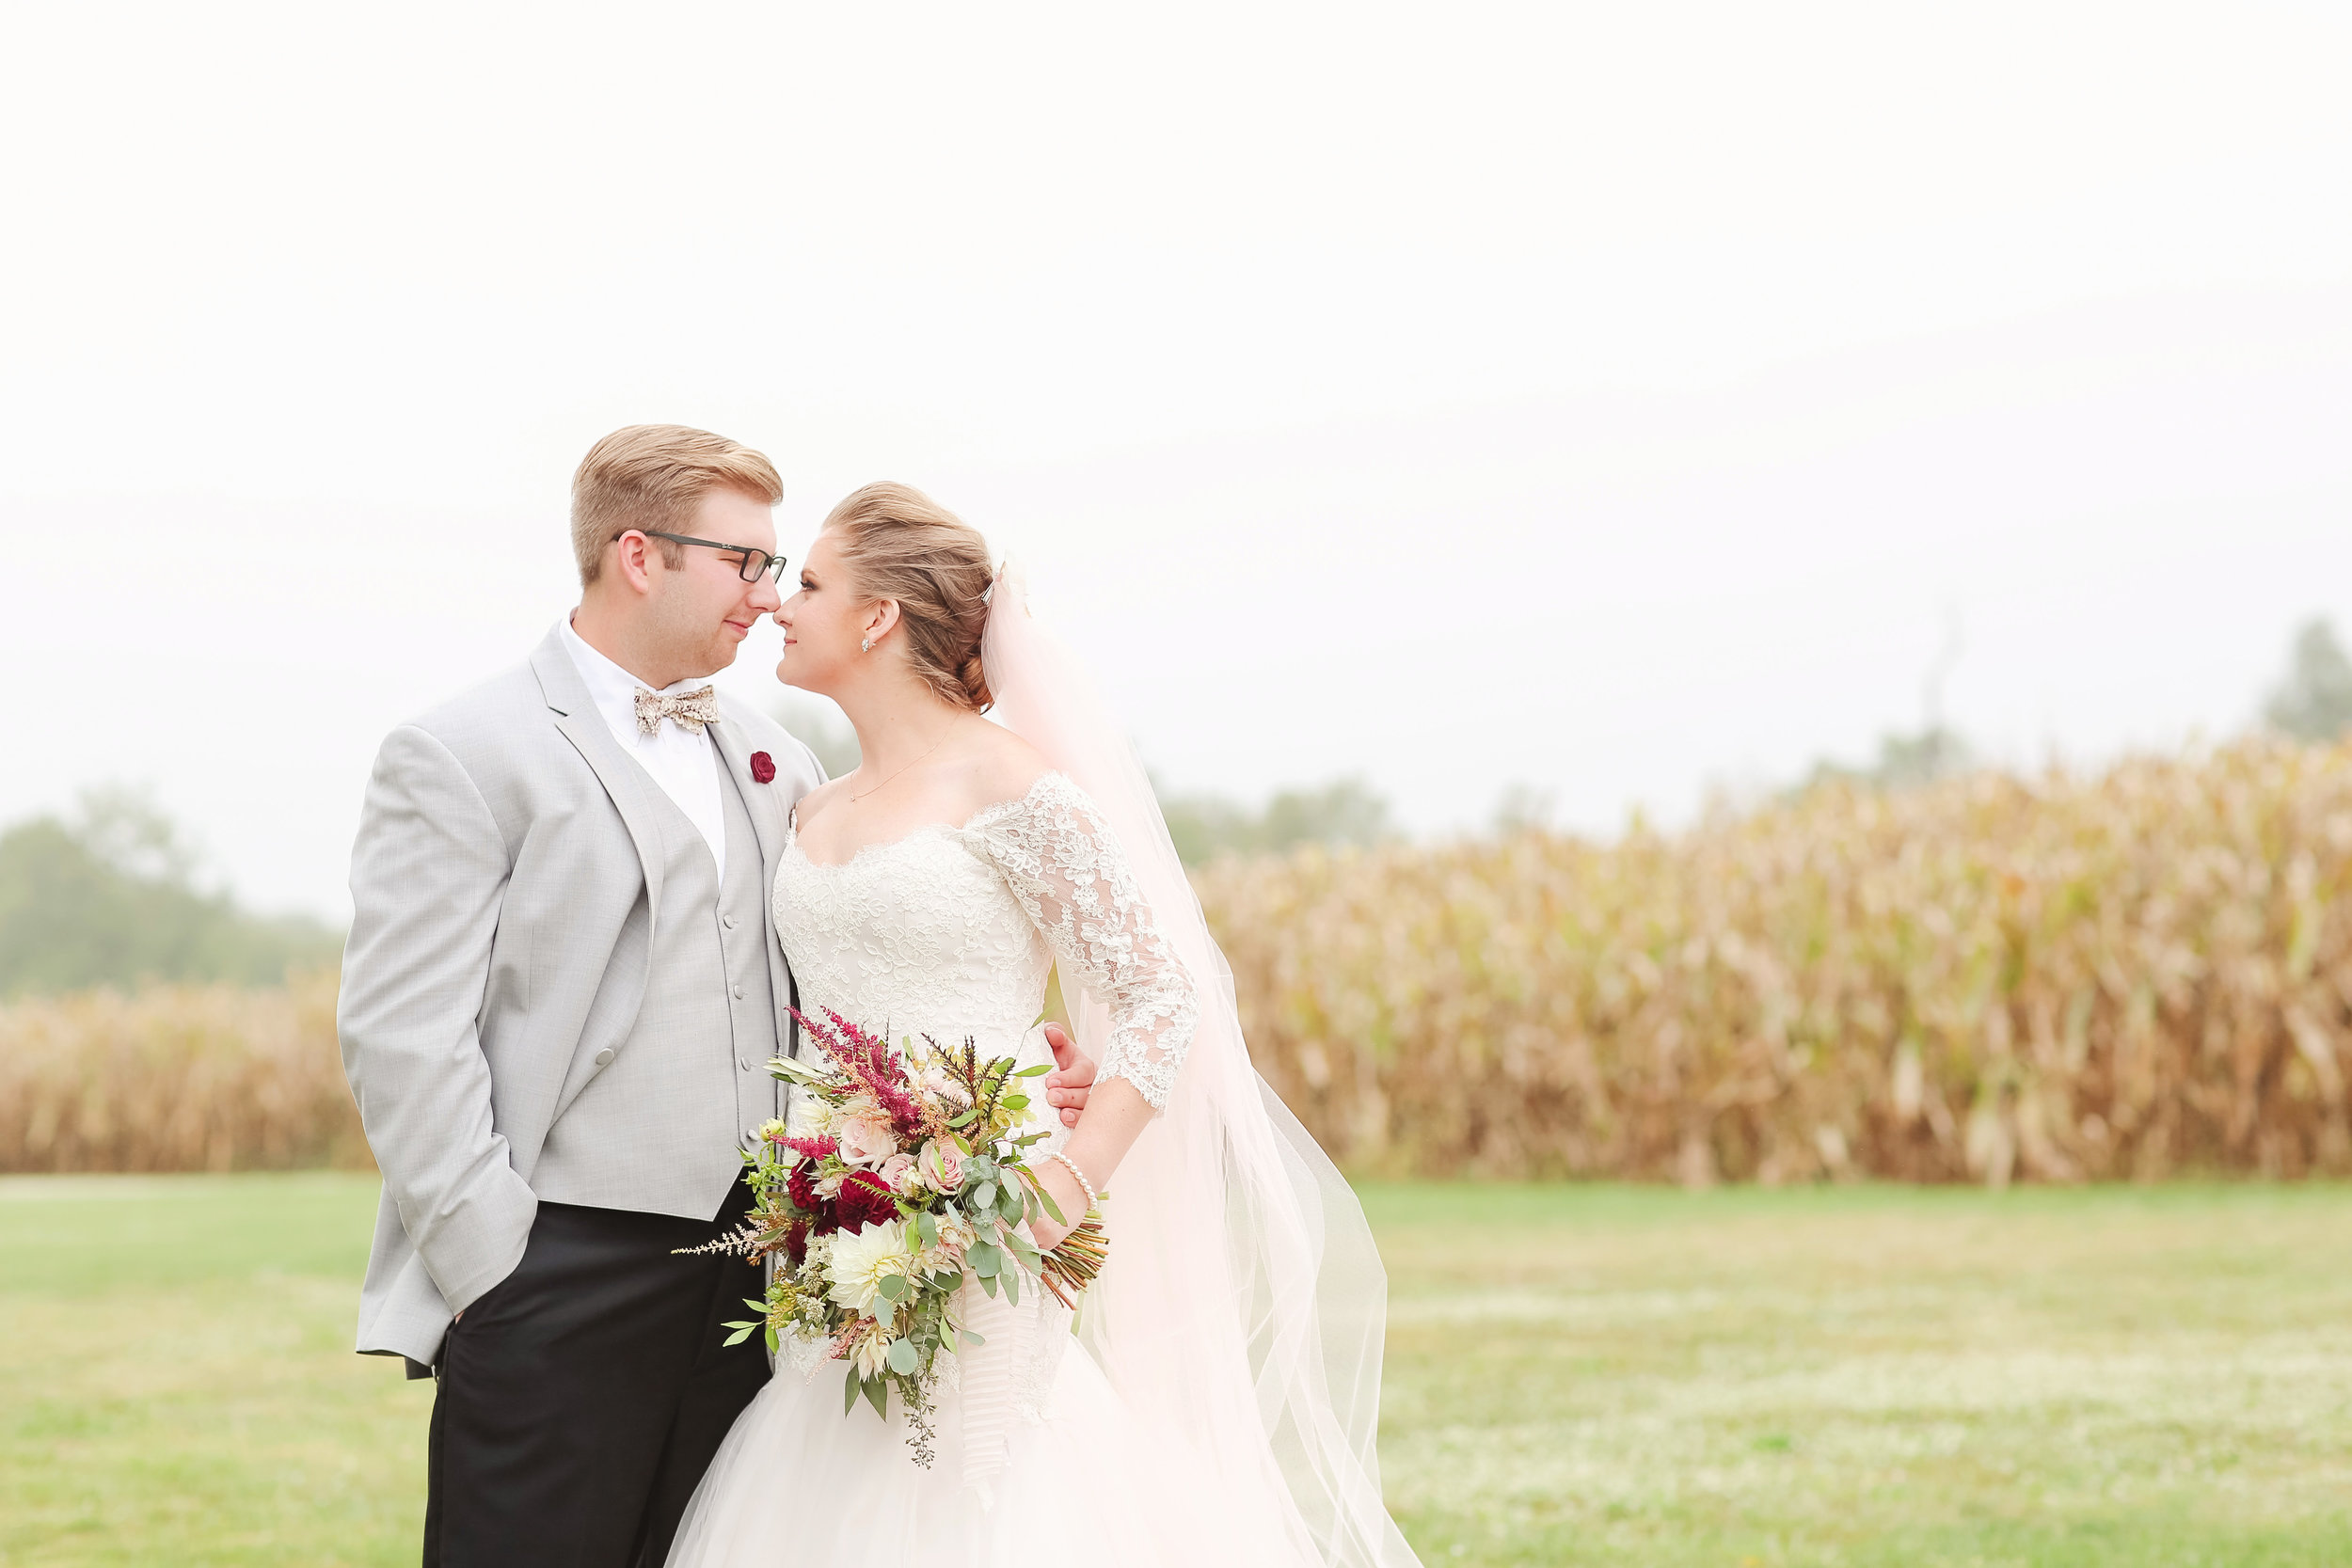 Danielle&Bryan_WeddingStyleGuide 1